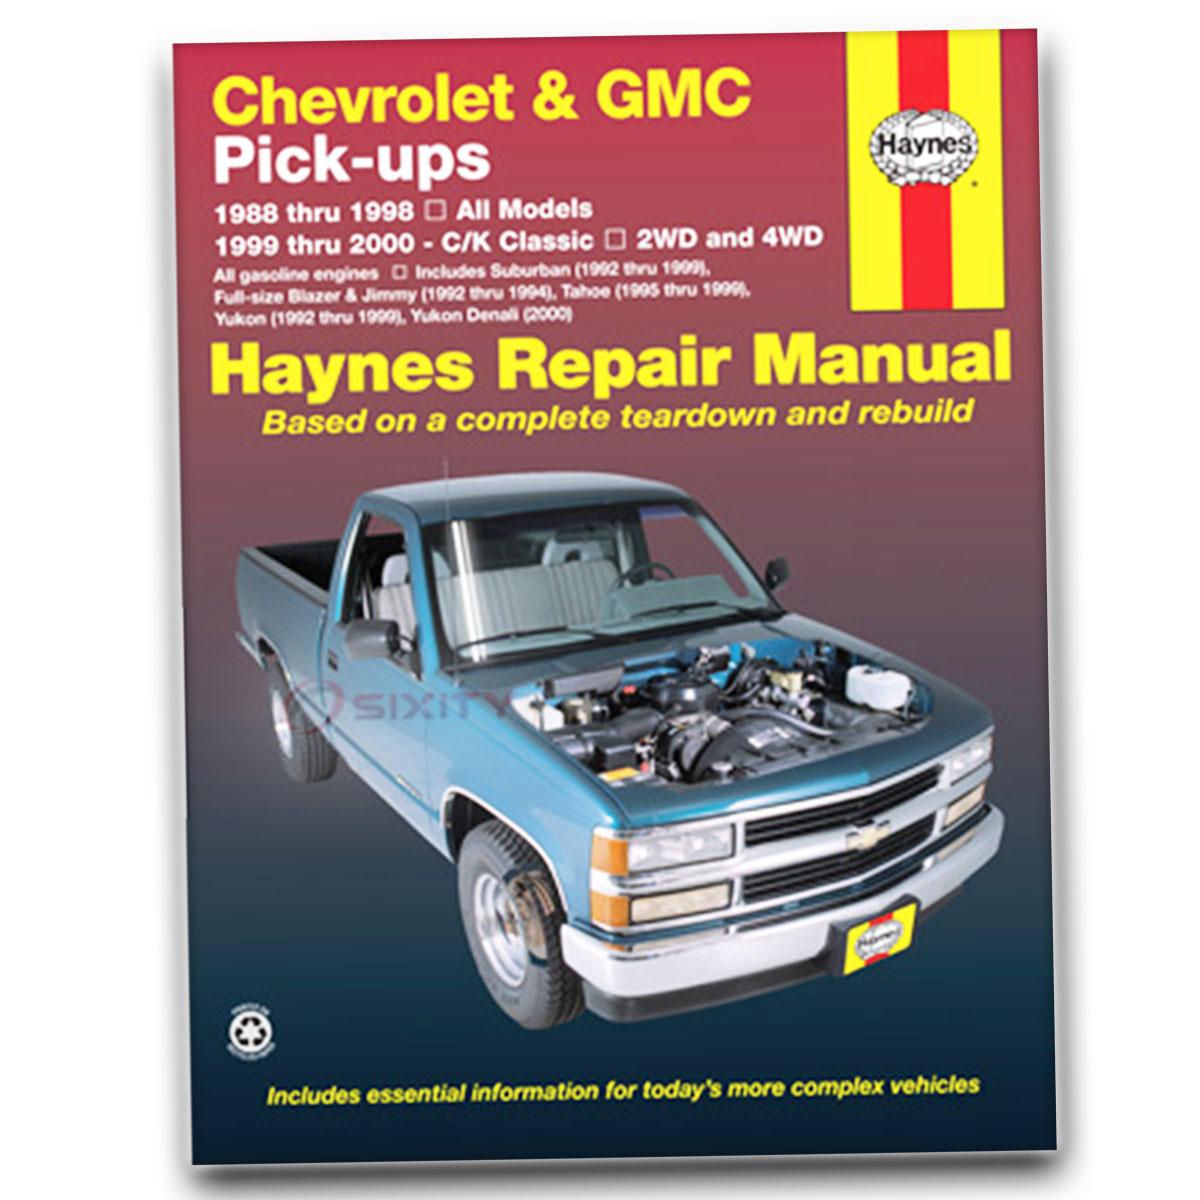 gmc k1500 suburban haynes repair manual slt sle base shop service rh ebay com 1997 GMC Suburban 2002 GMC Suburban